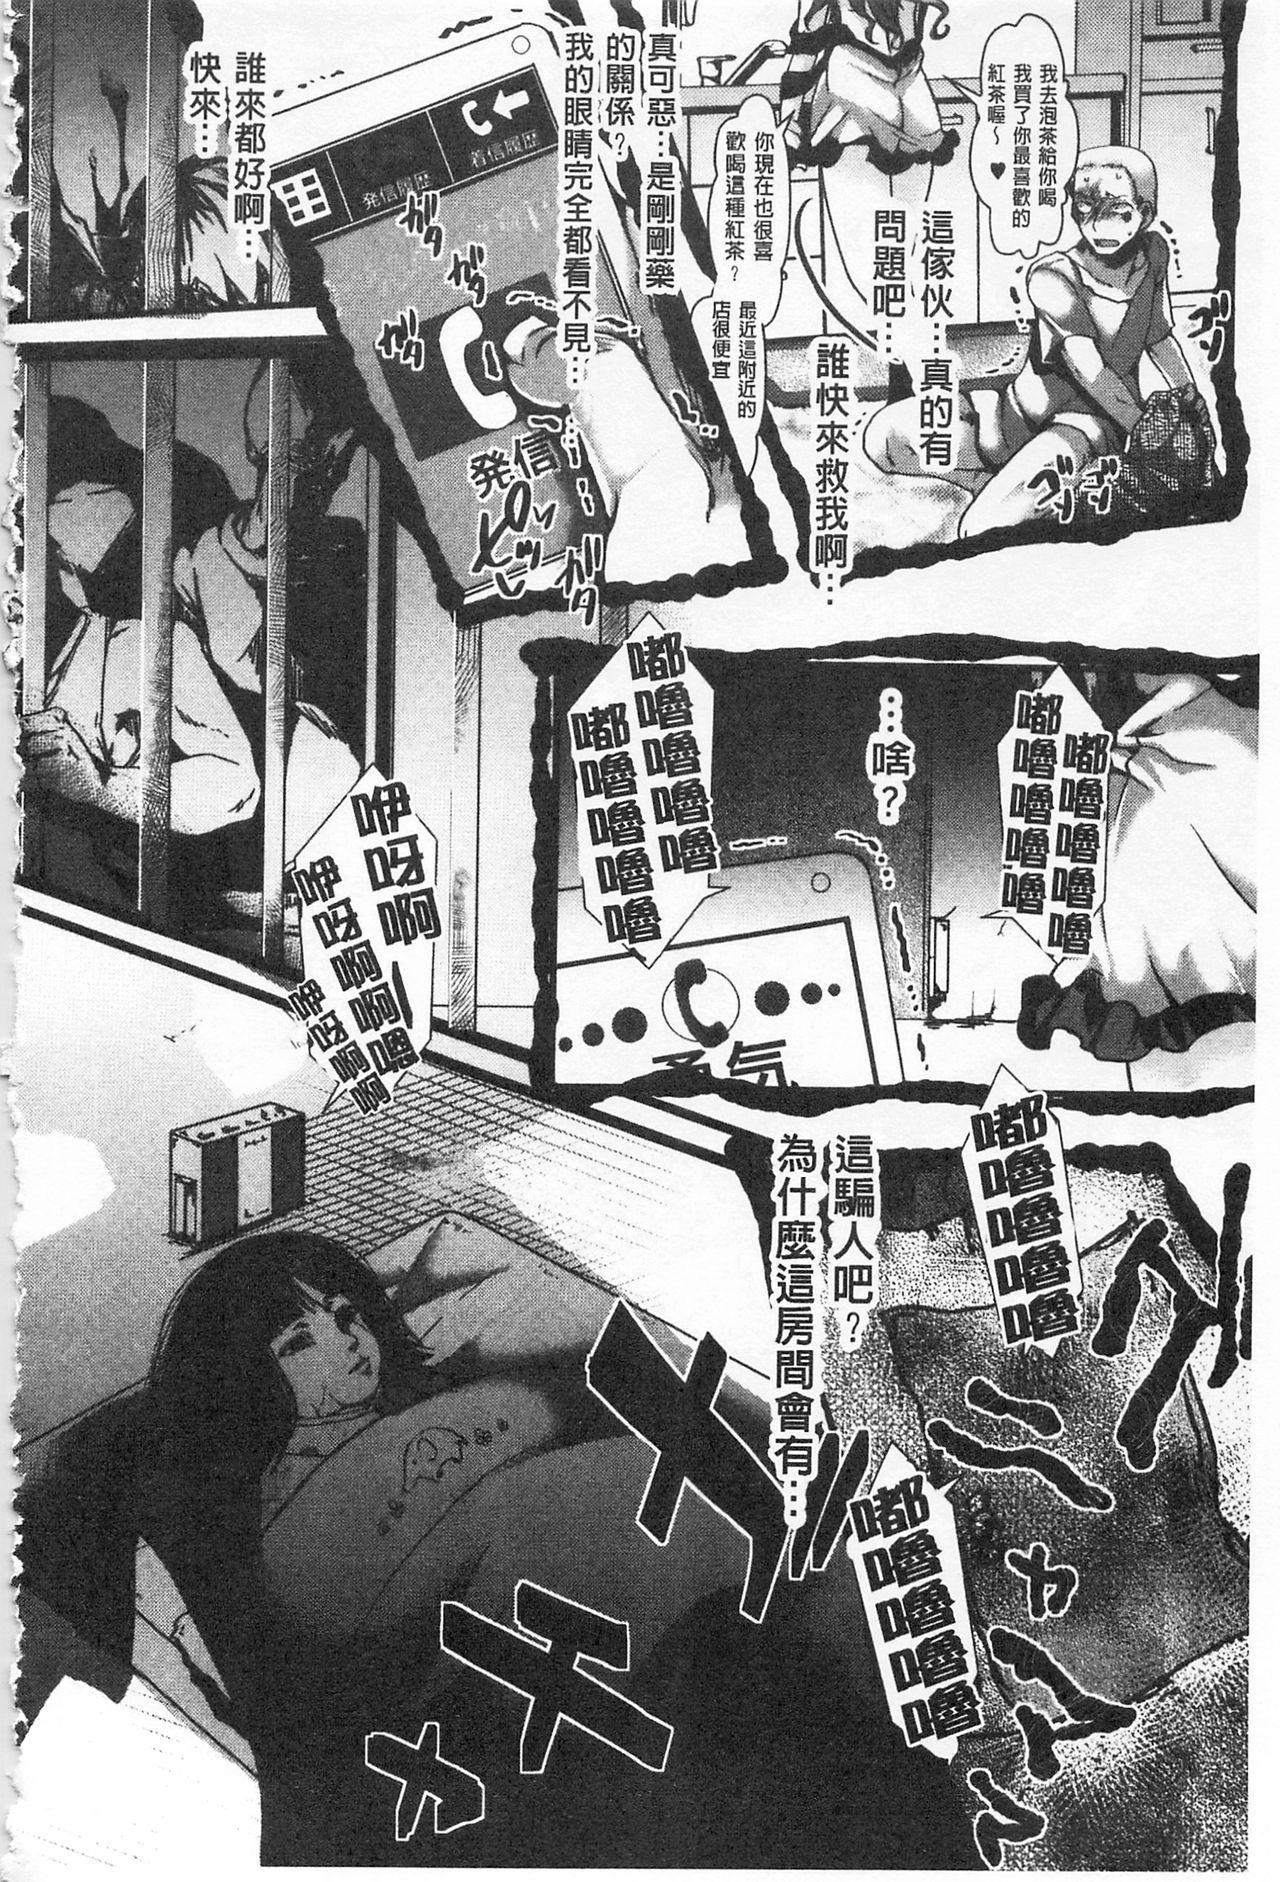 [hal] Daienjou -Ikare Ikasare Iki Ikare-   ∞艶嬢 -洩出來被搞到洩掛了被搞掛-  [Chinese] 57